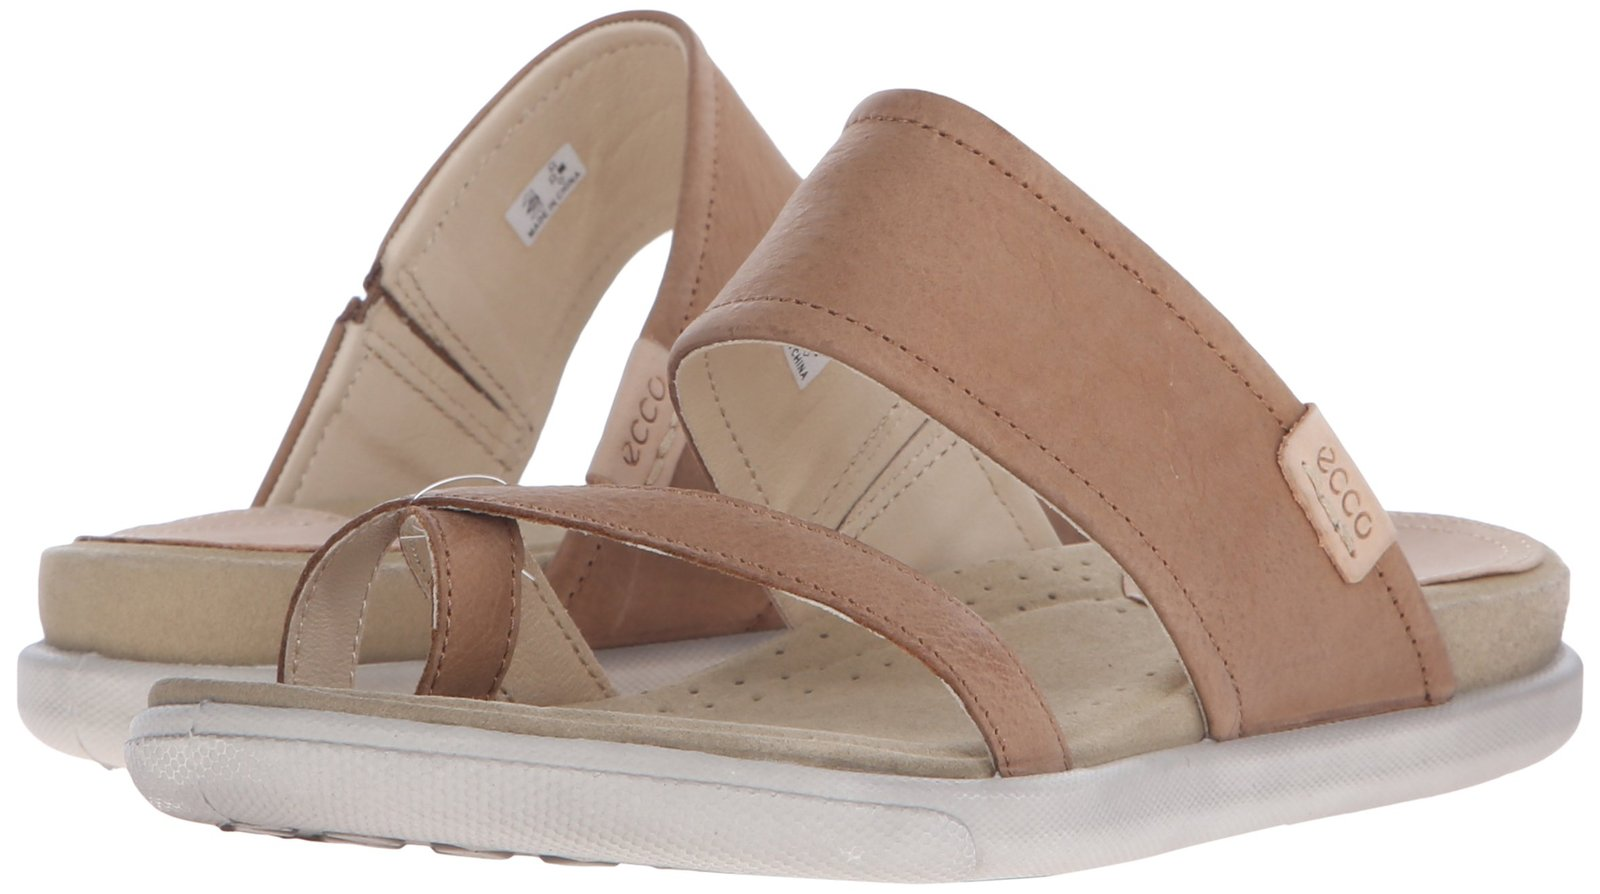 c1d8679d01c0 Ecco Footwear Womens Damara Sandal Flip and similar items